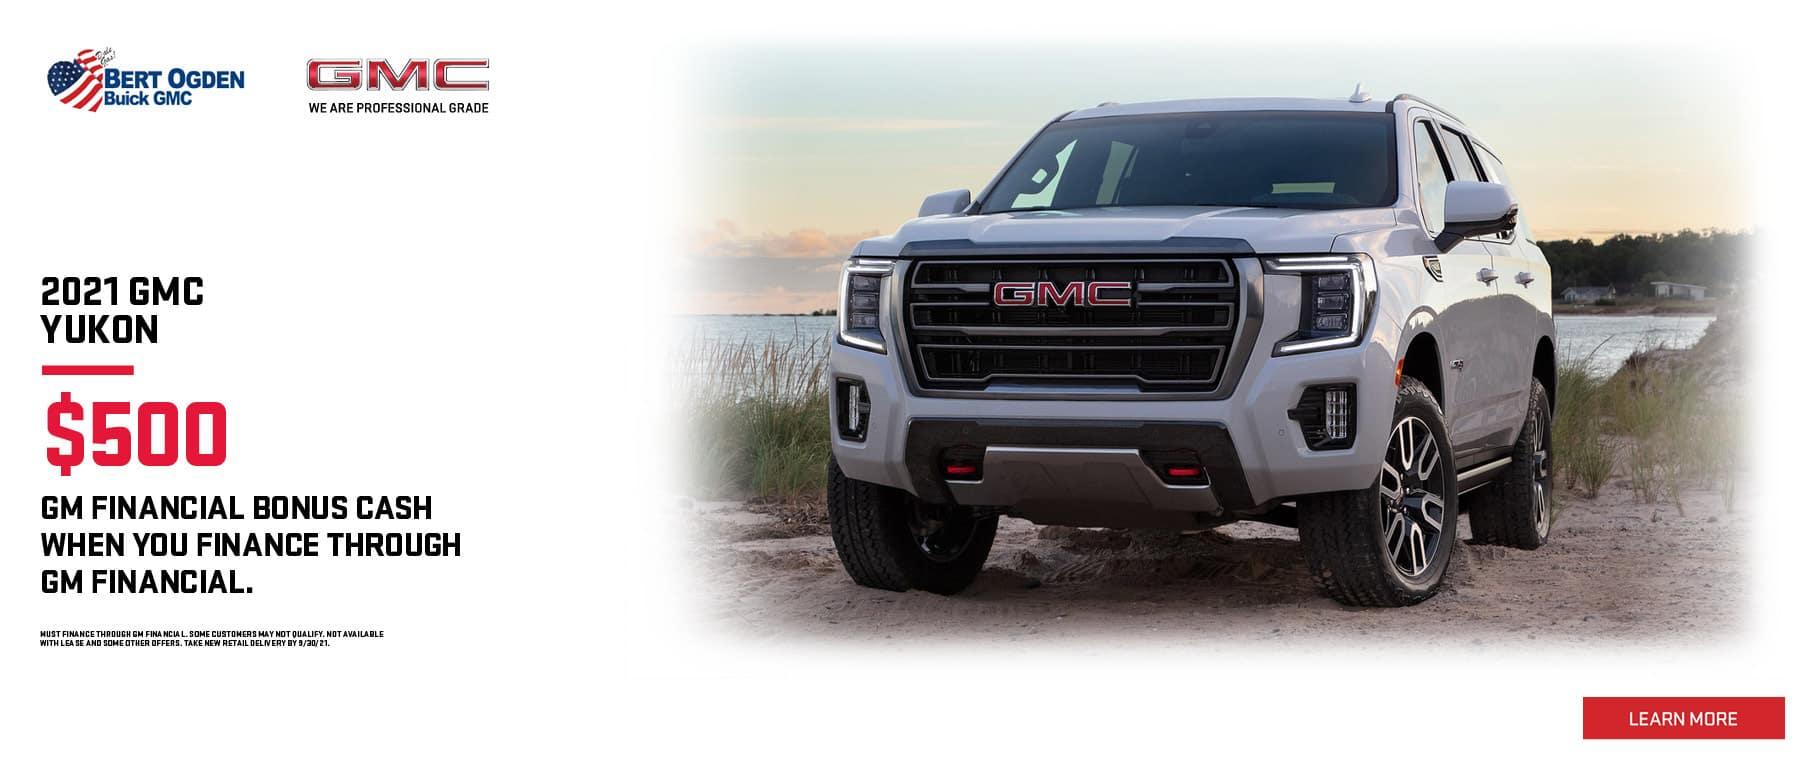 2021 GMC Yukon Offer | Bert Ogden Buick GMC in Edinburg, Texas